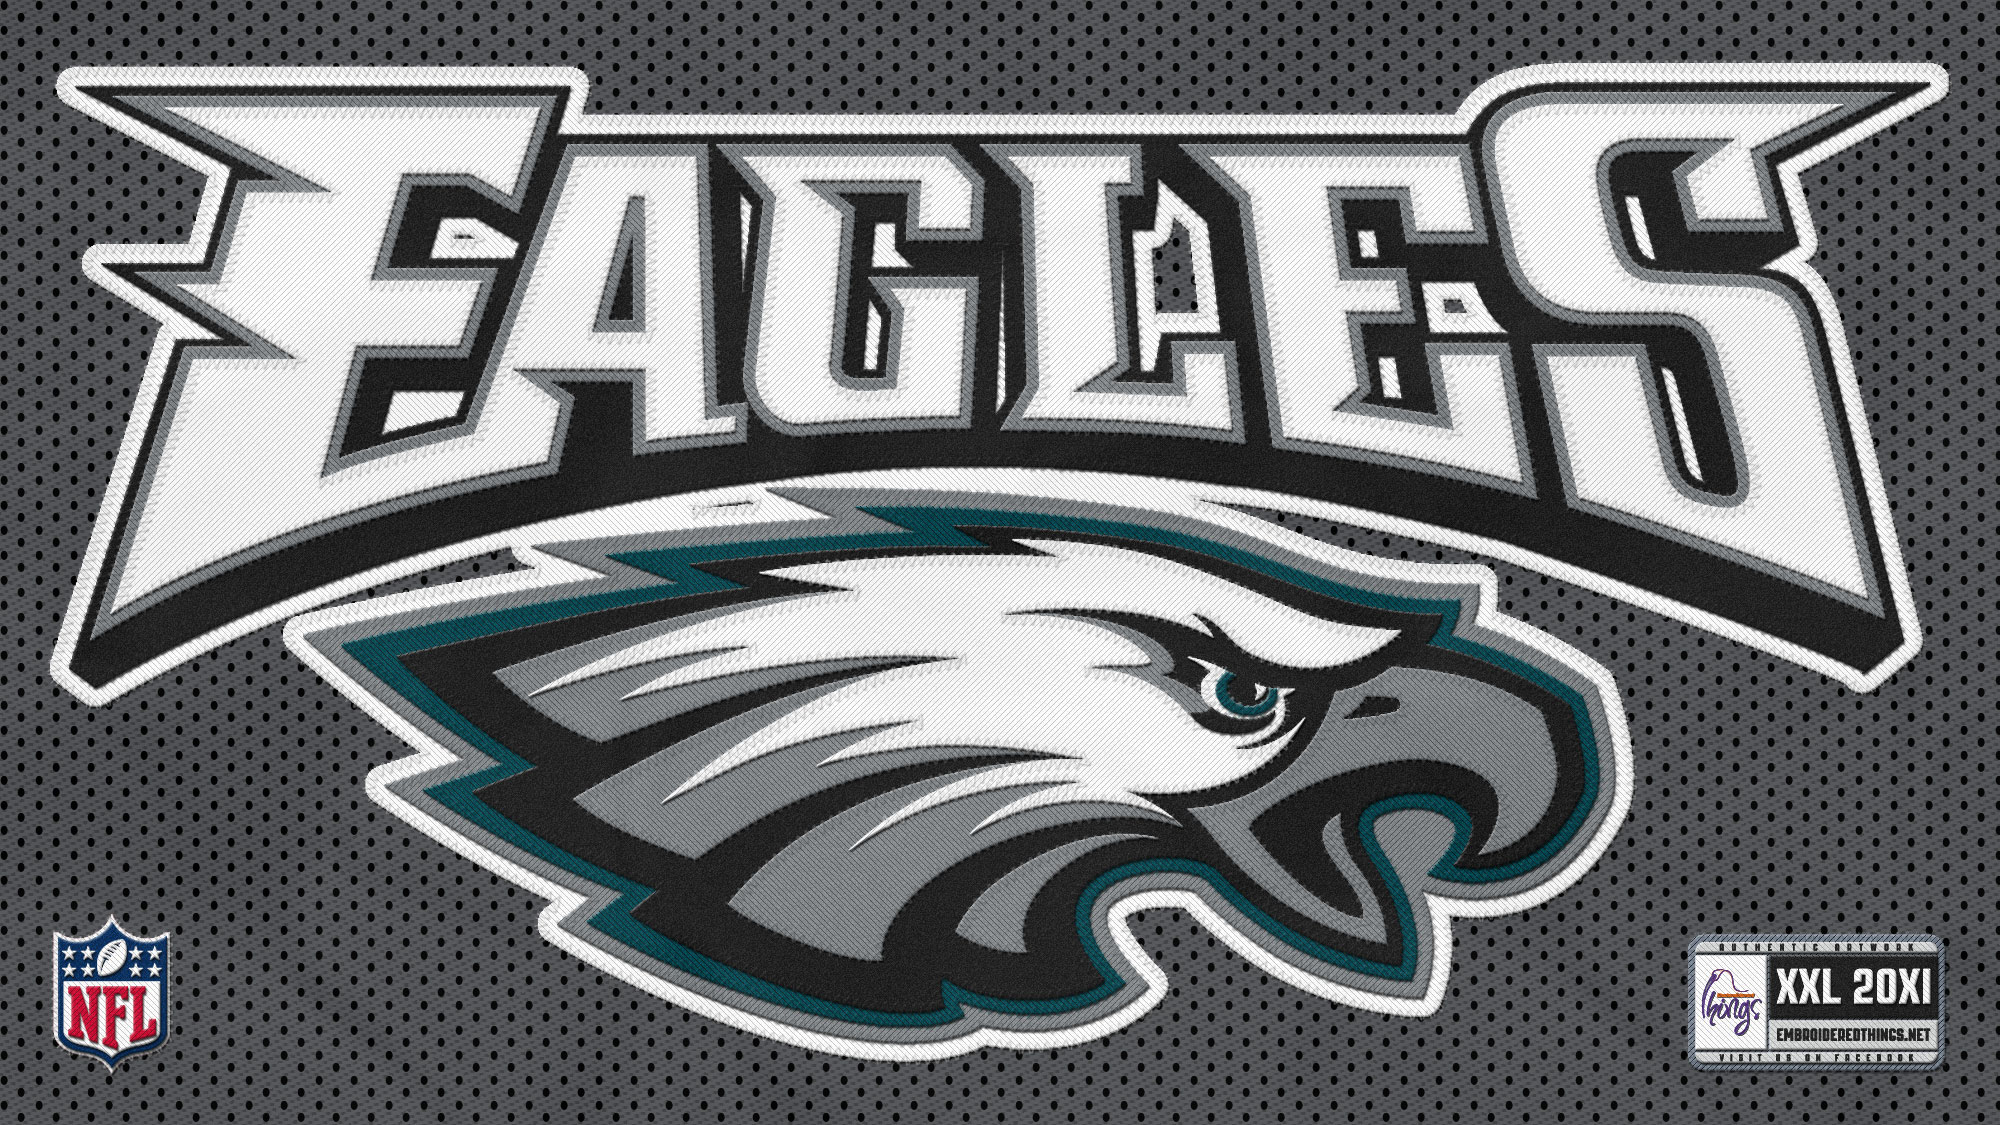 Eagles football team wallpaper - photo#19